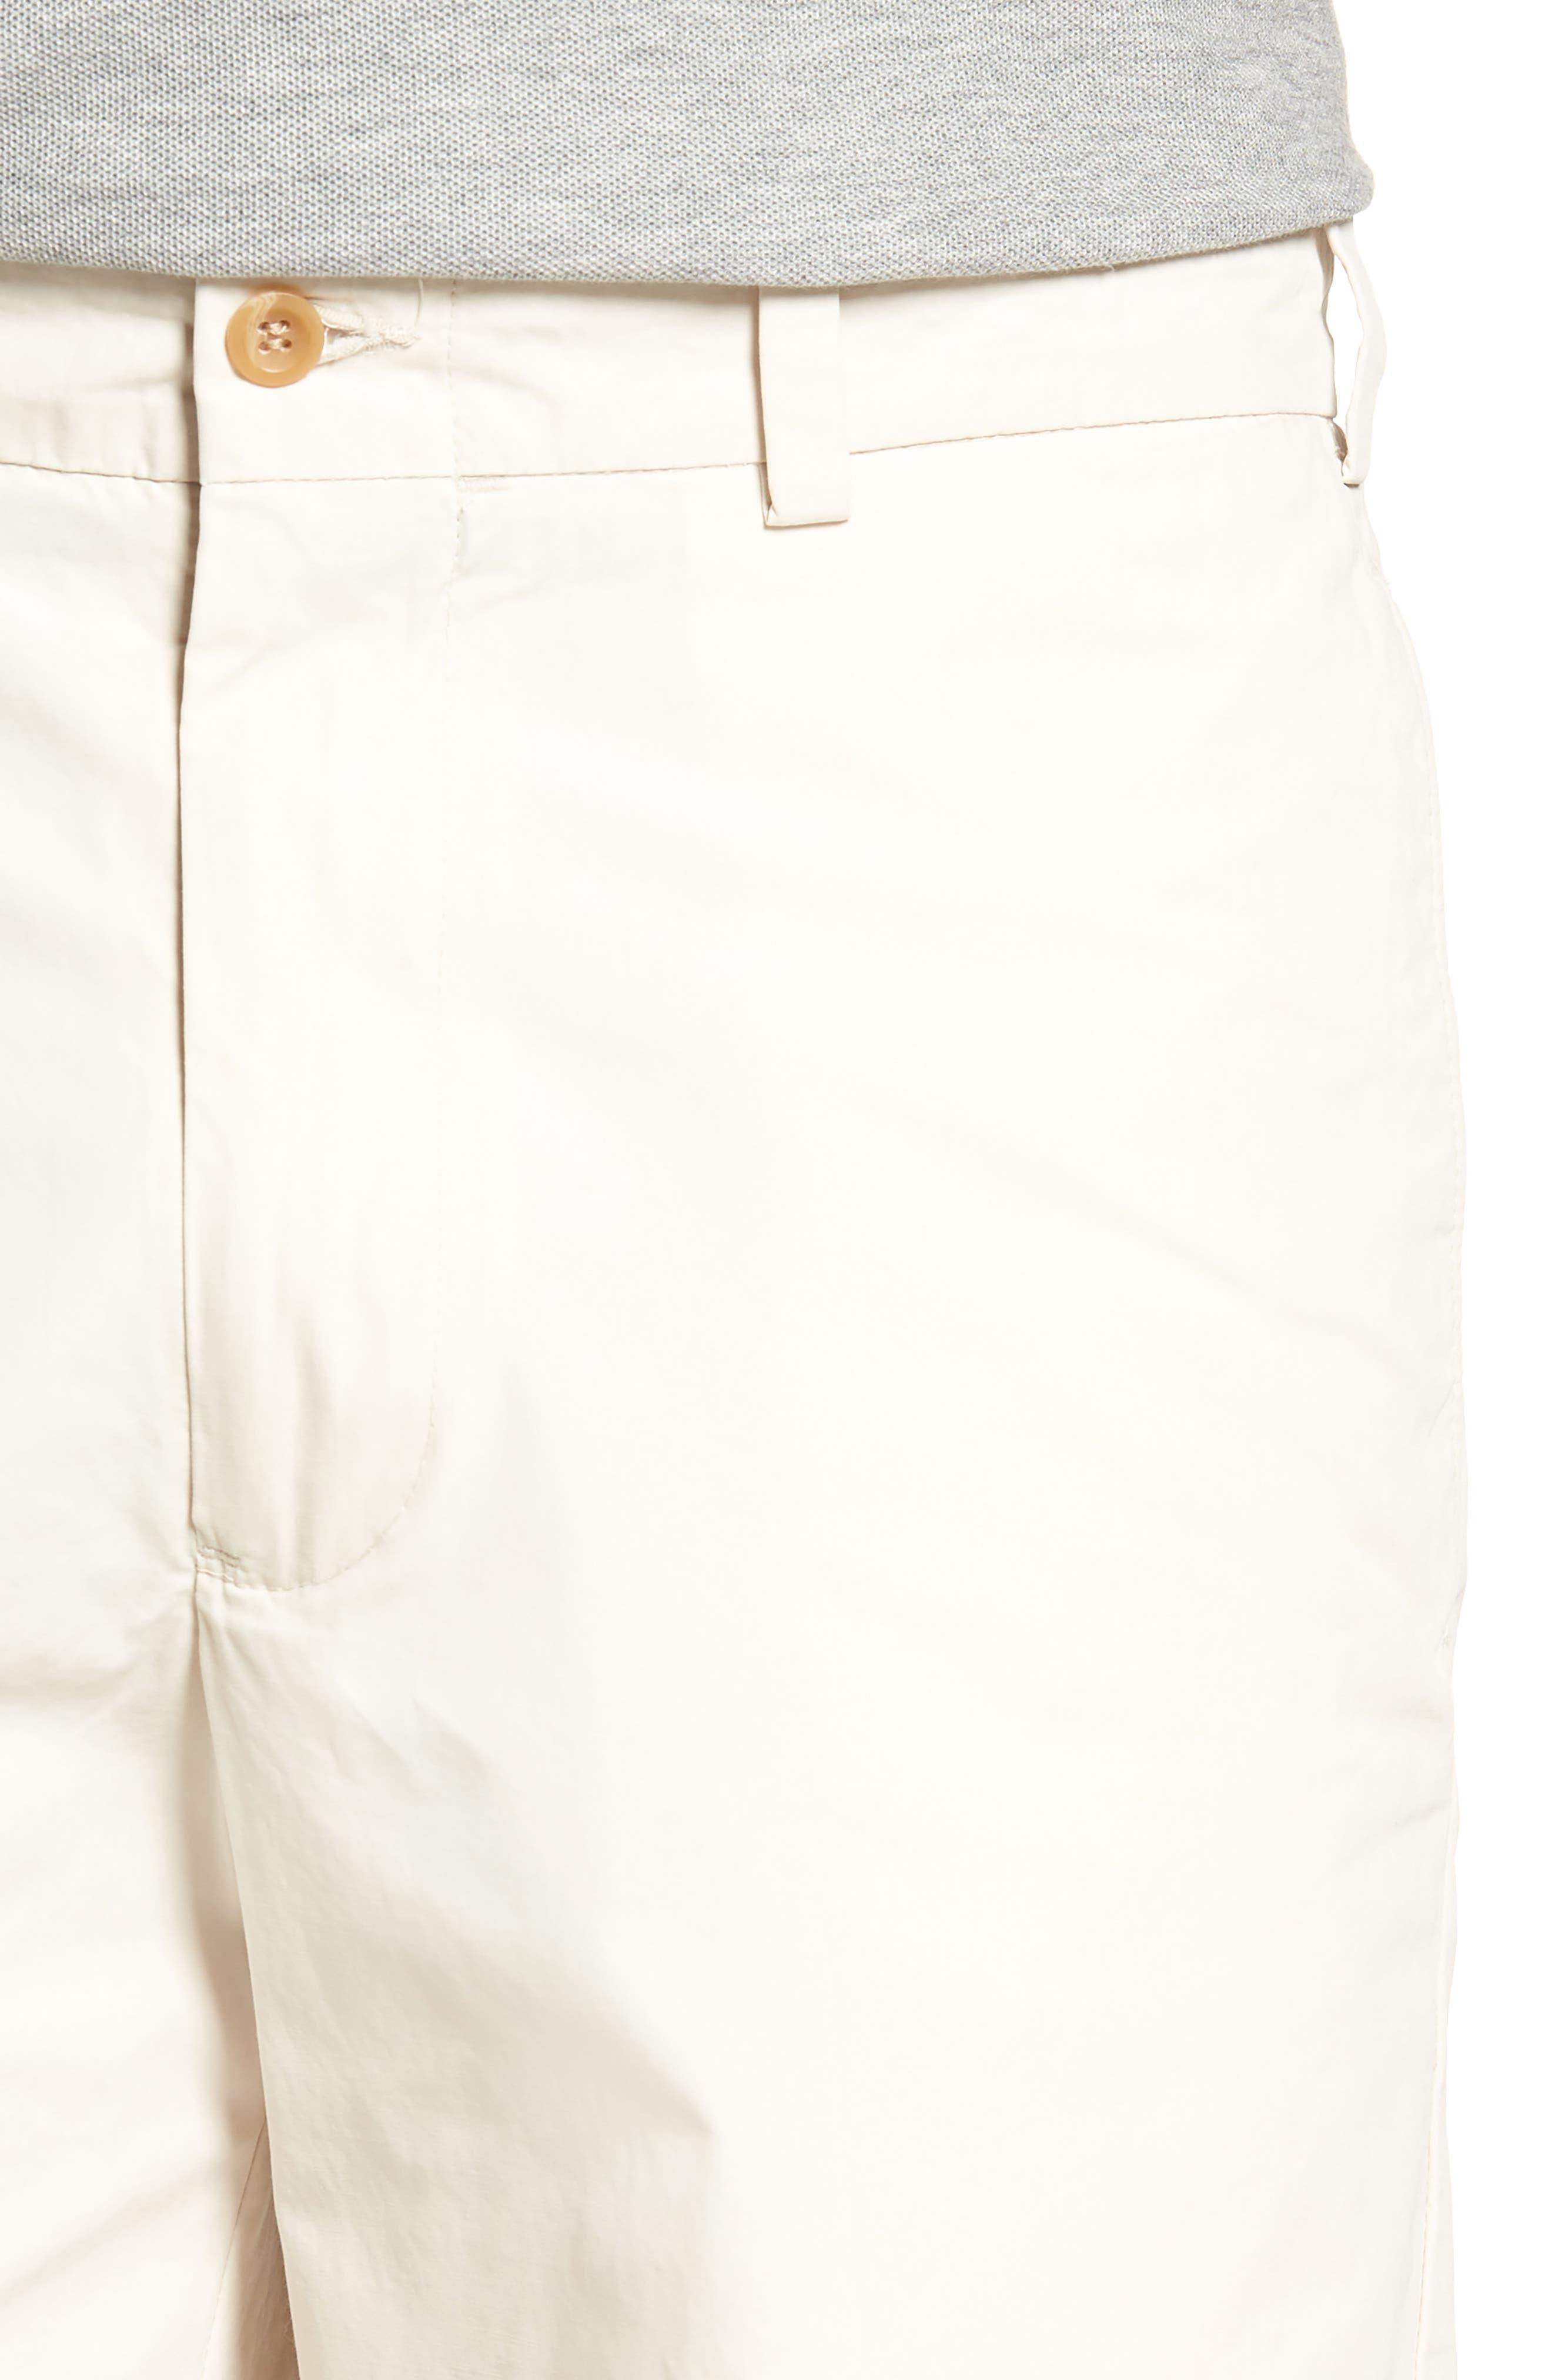 M2 Standard Fit Flat Front Tropical Cotton Poplin Shorts,                             Alternate thumbnail 4, color,                             280